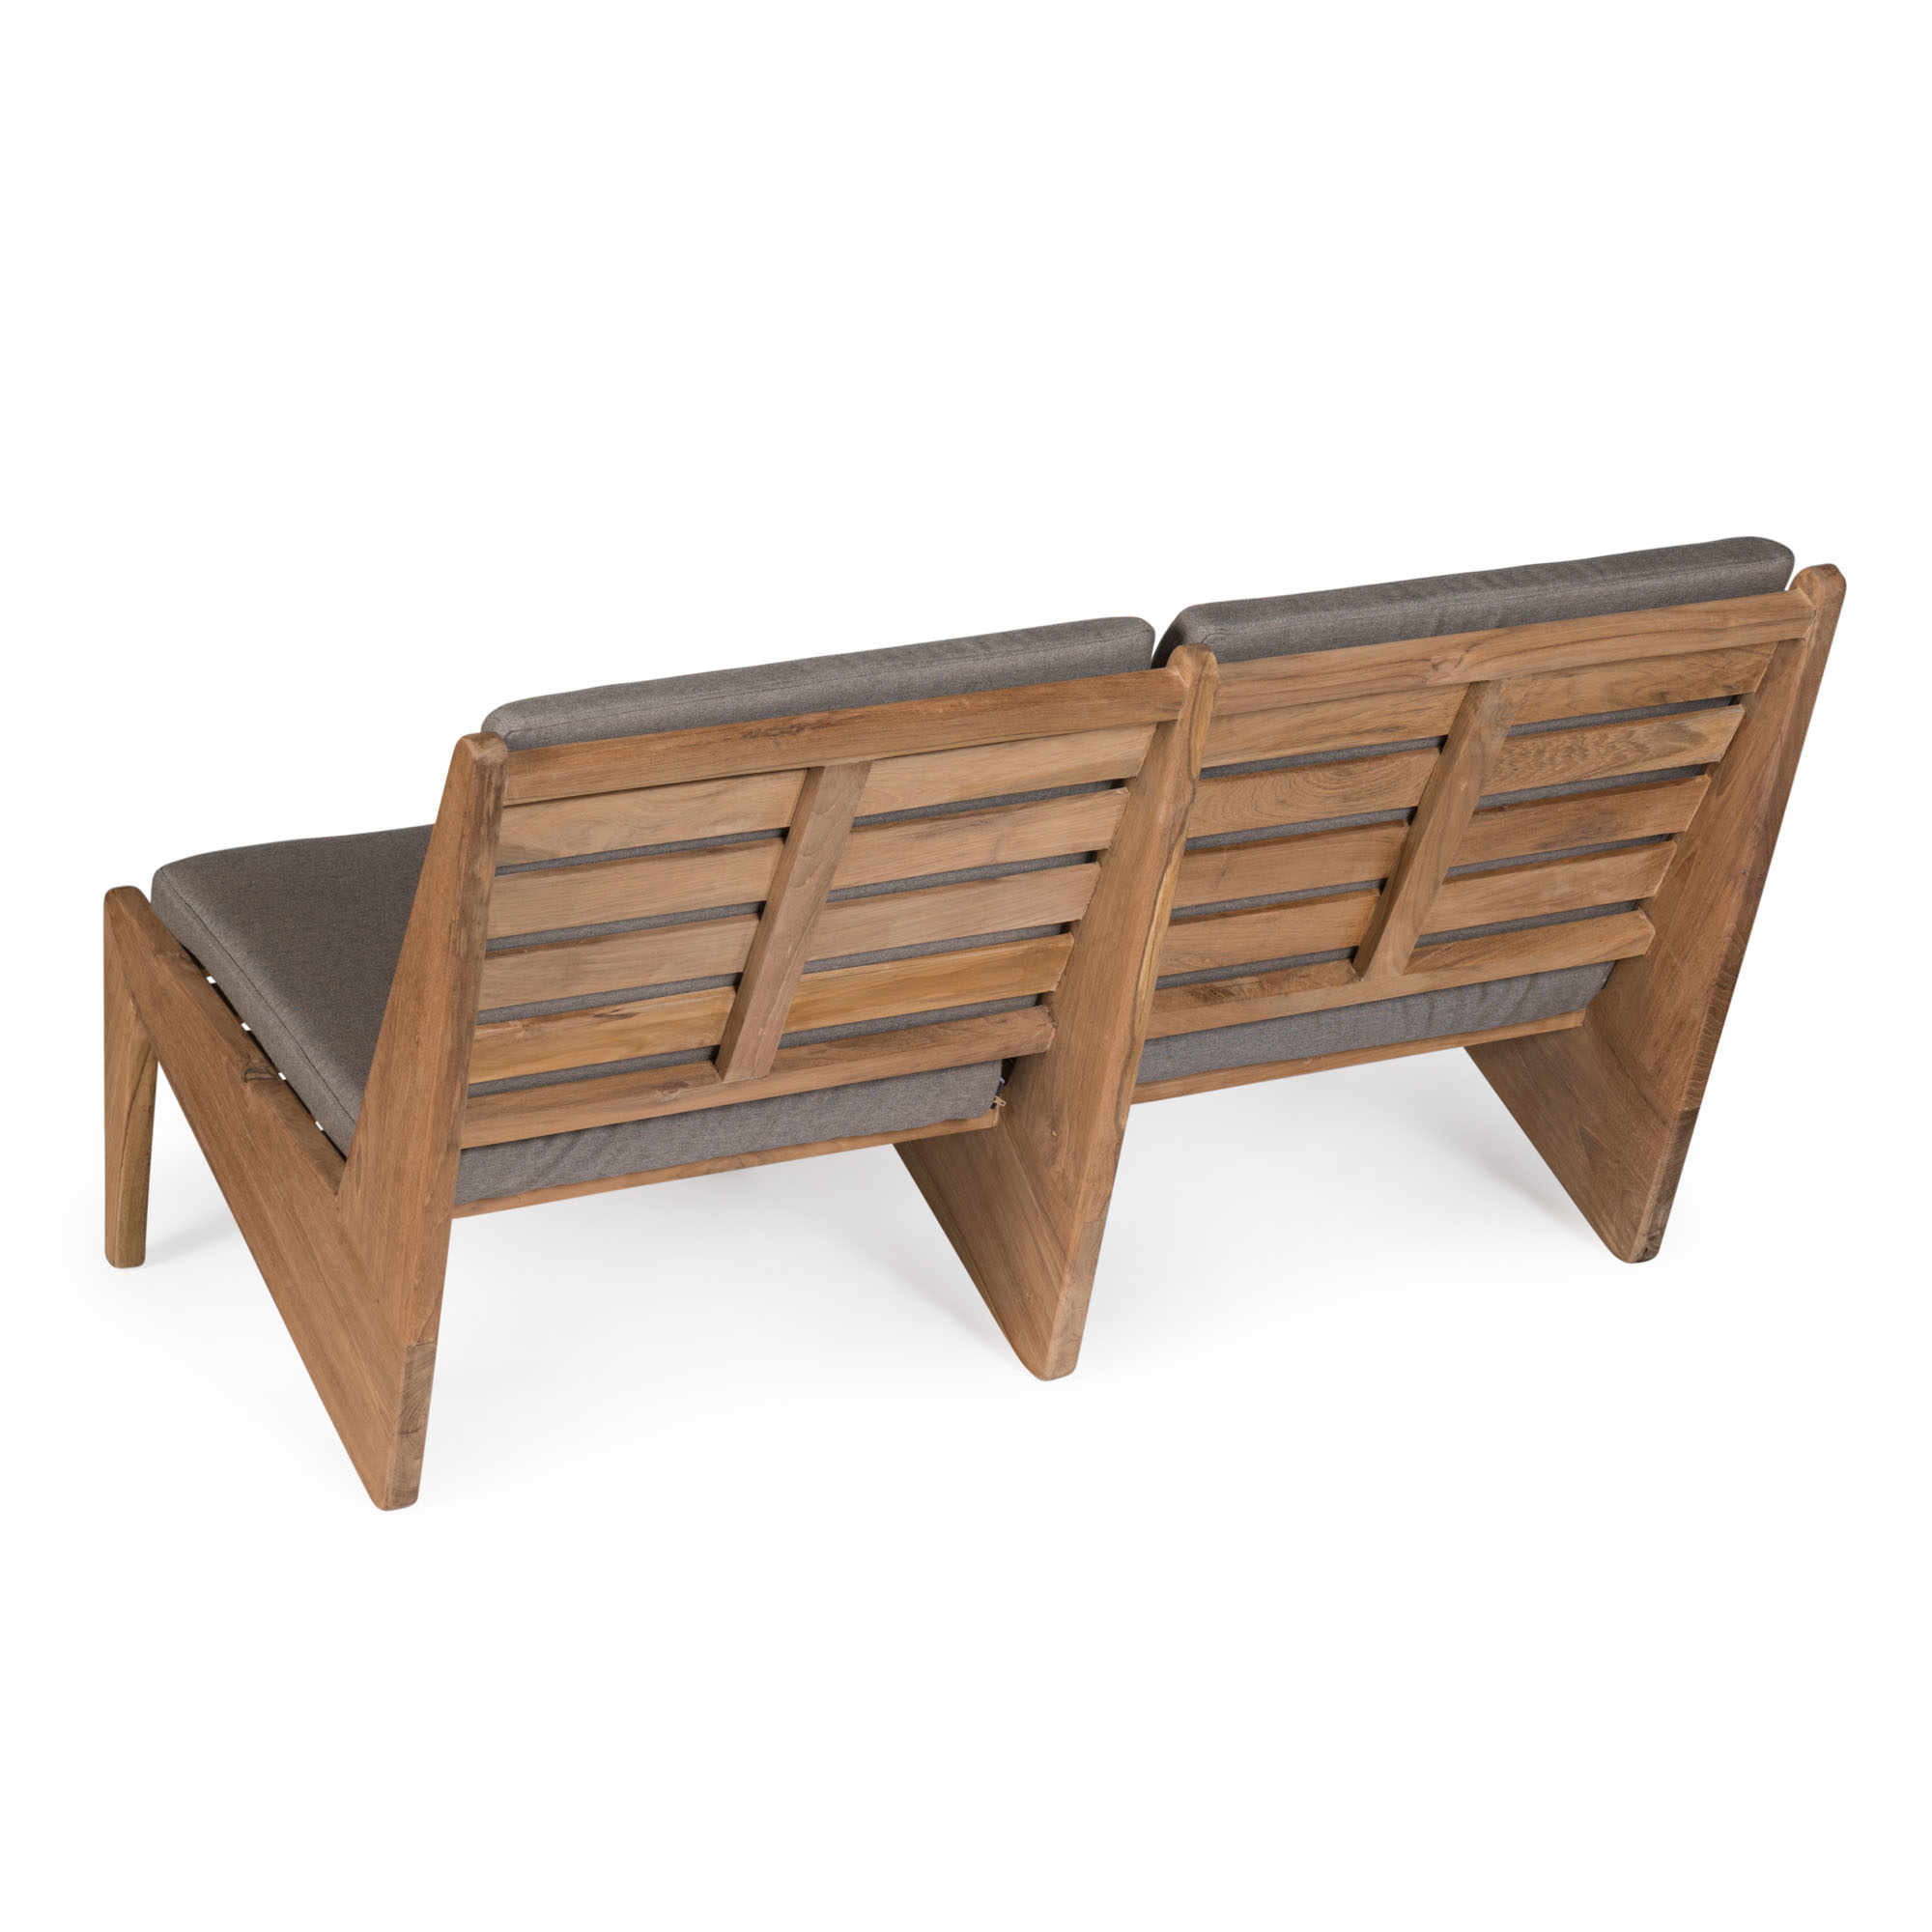 Kangaroo Chair  Bench 2 - Teak Outdoor with Cushion-4